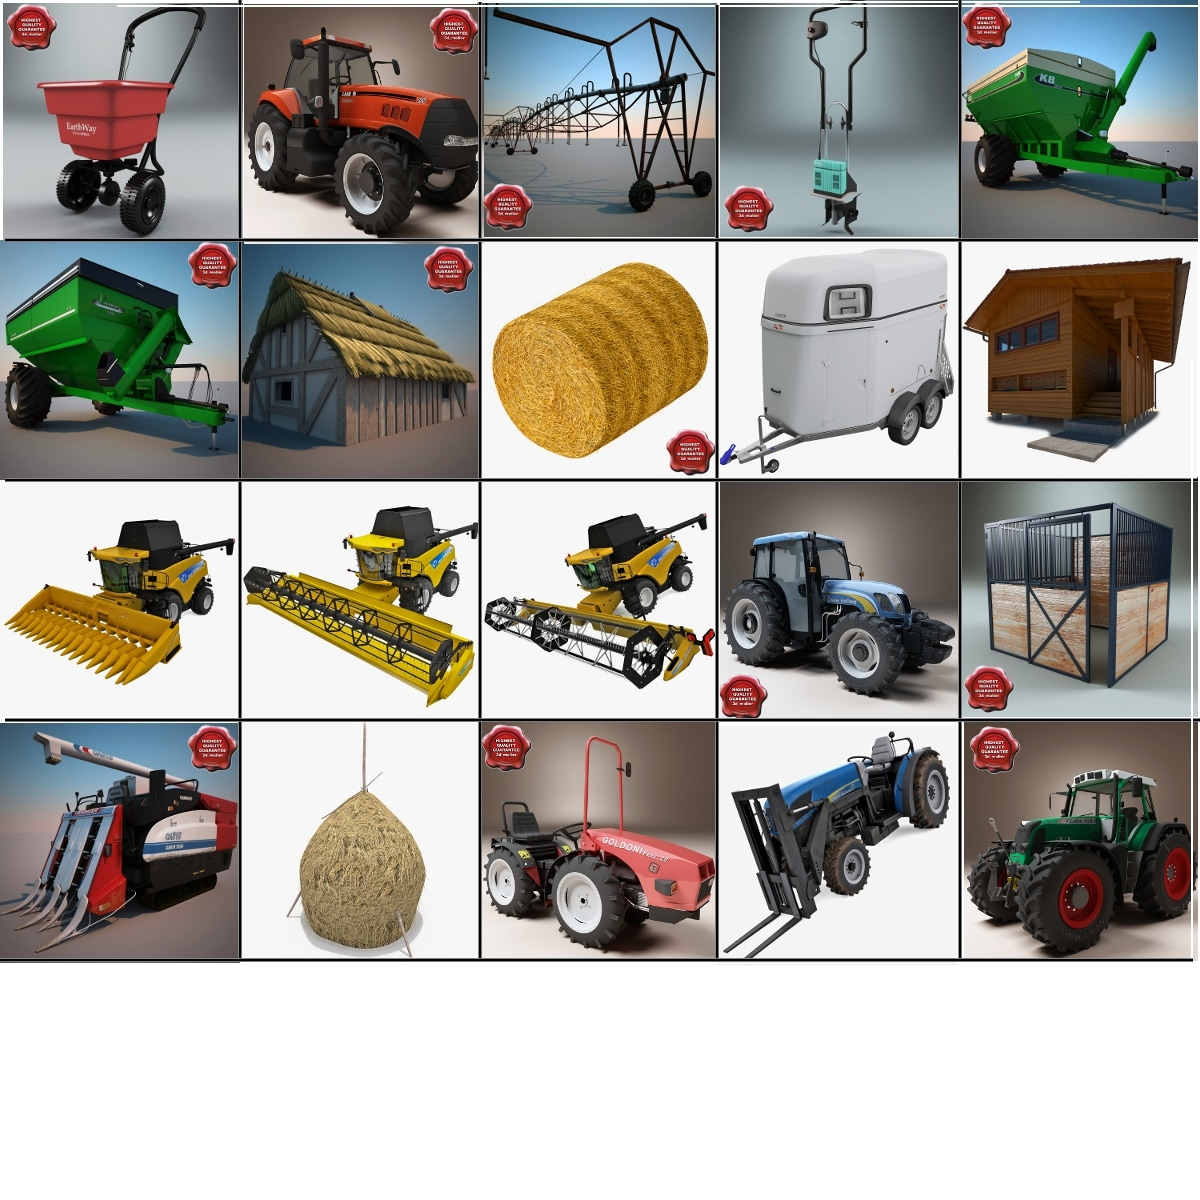 farm_collection.jpg